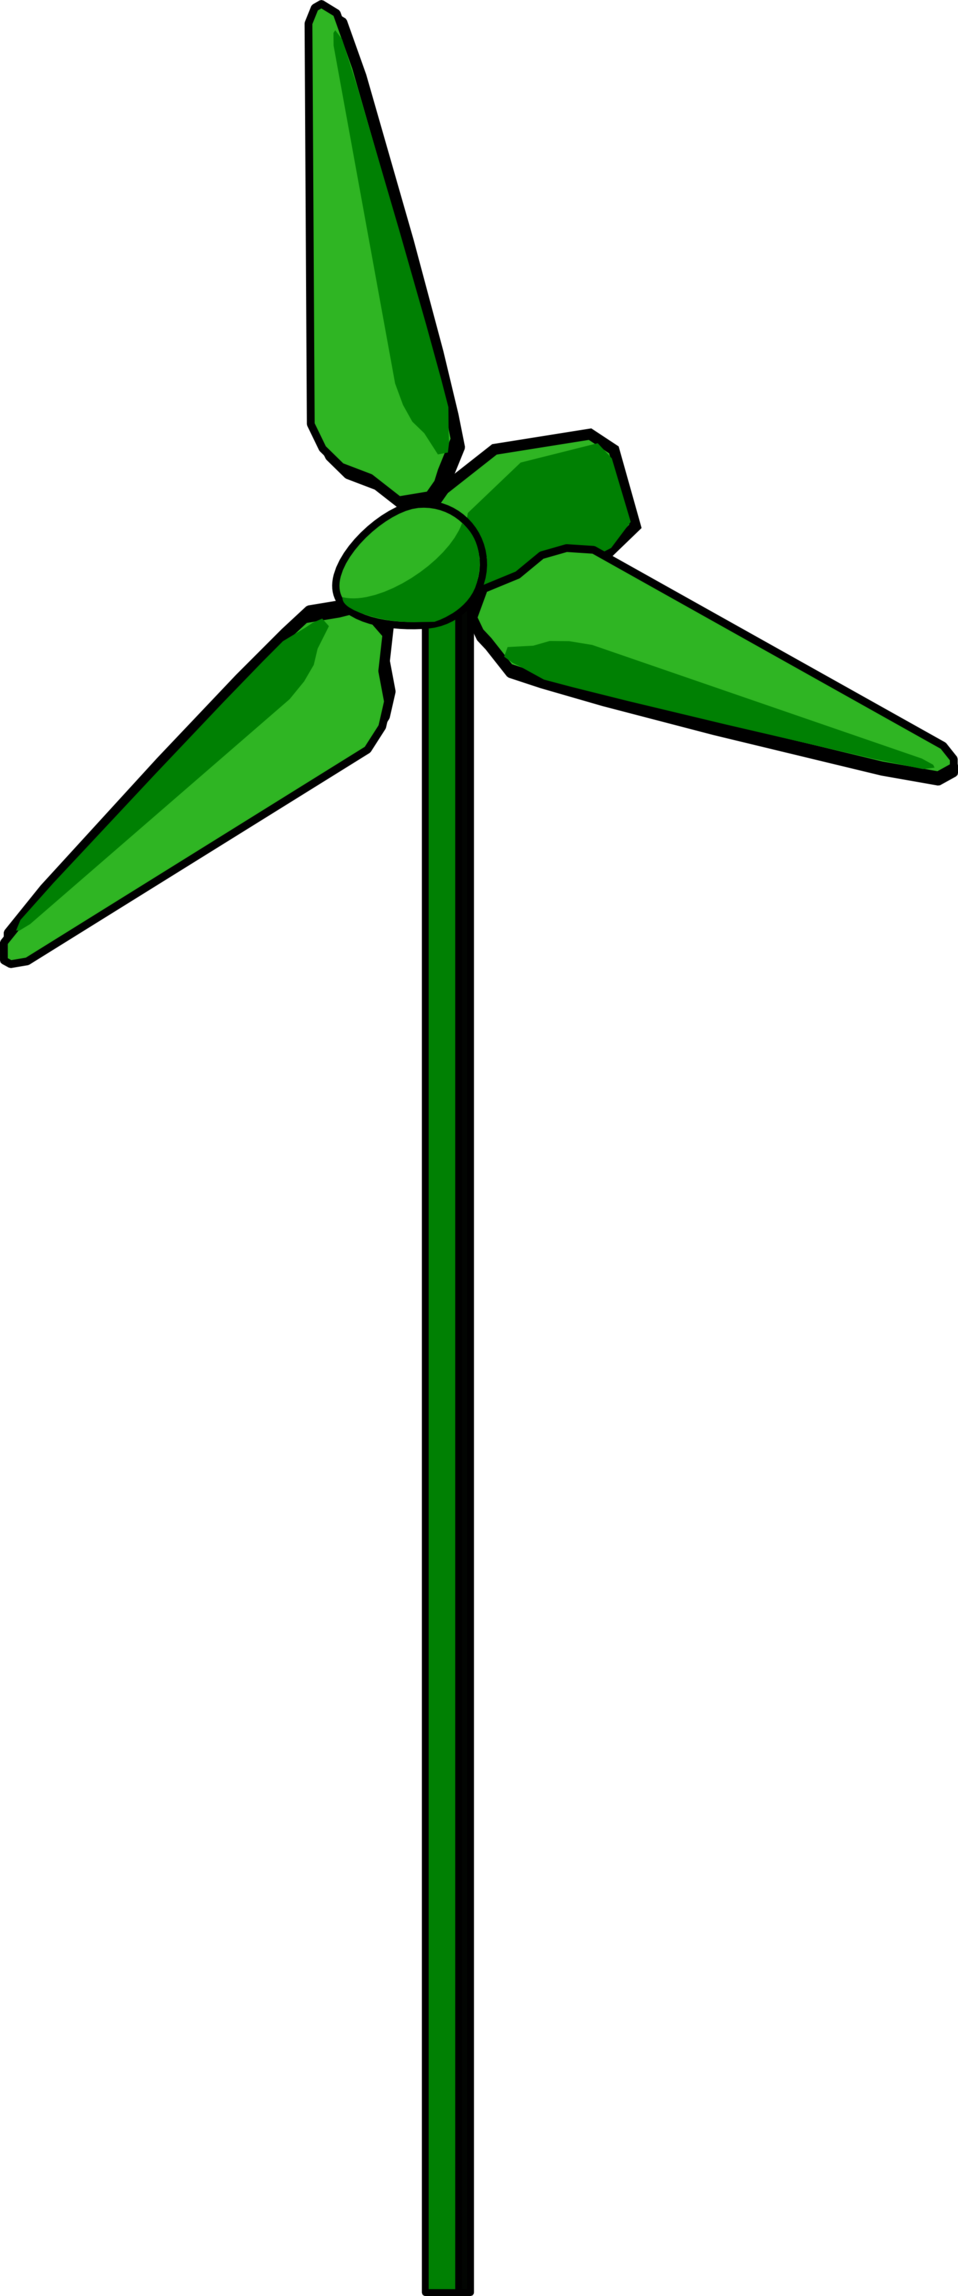 Wind tree clipart banner freeuse download Public Domain Clip Art Image | Wind Turbine Green | ID ... banner freeuse download